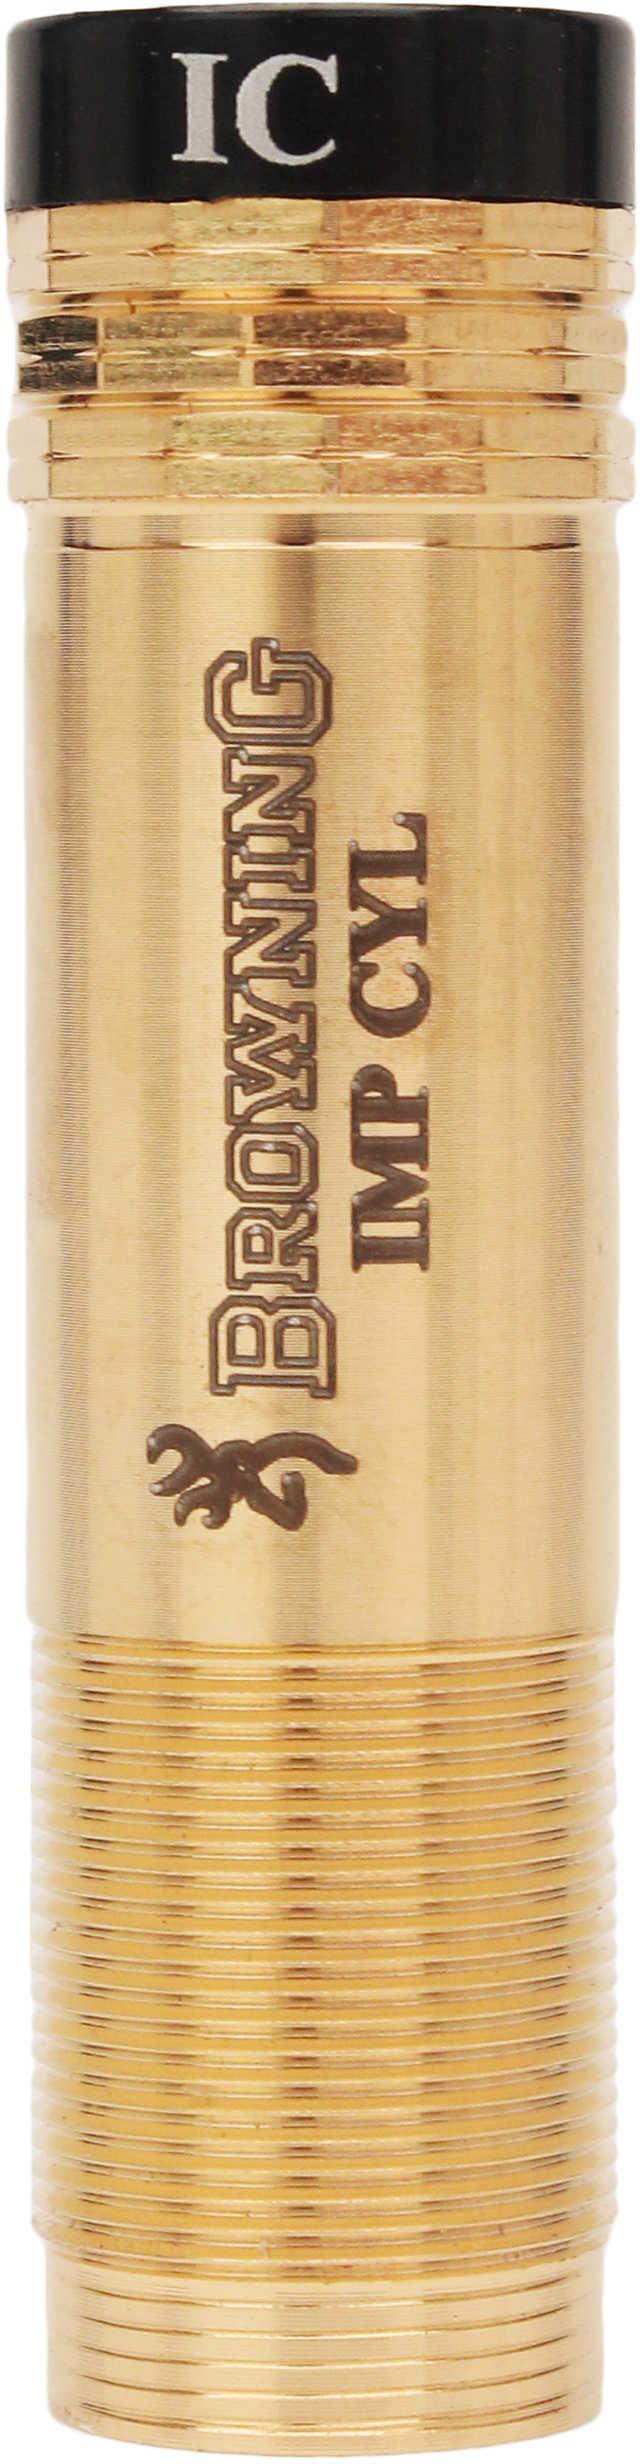 Browning 625 Diamond Grade Choke Tube 28 Gauge Improved Cylinder Md: 1136183